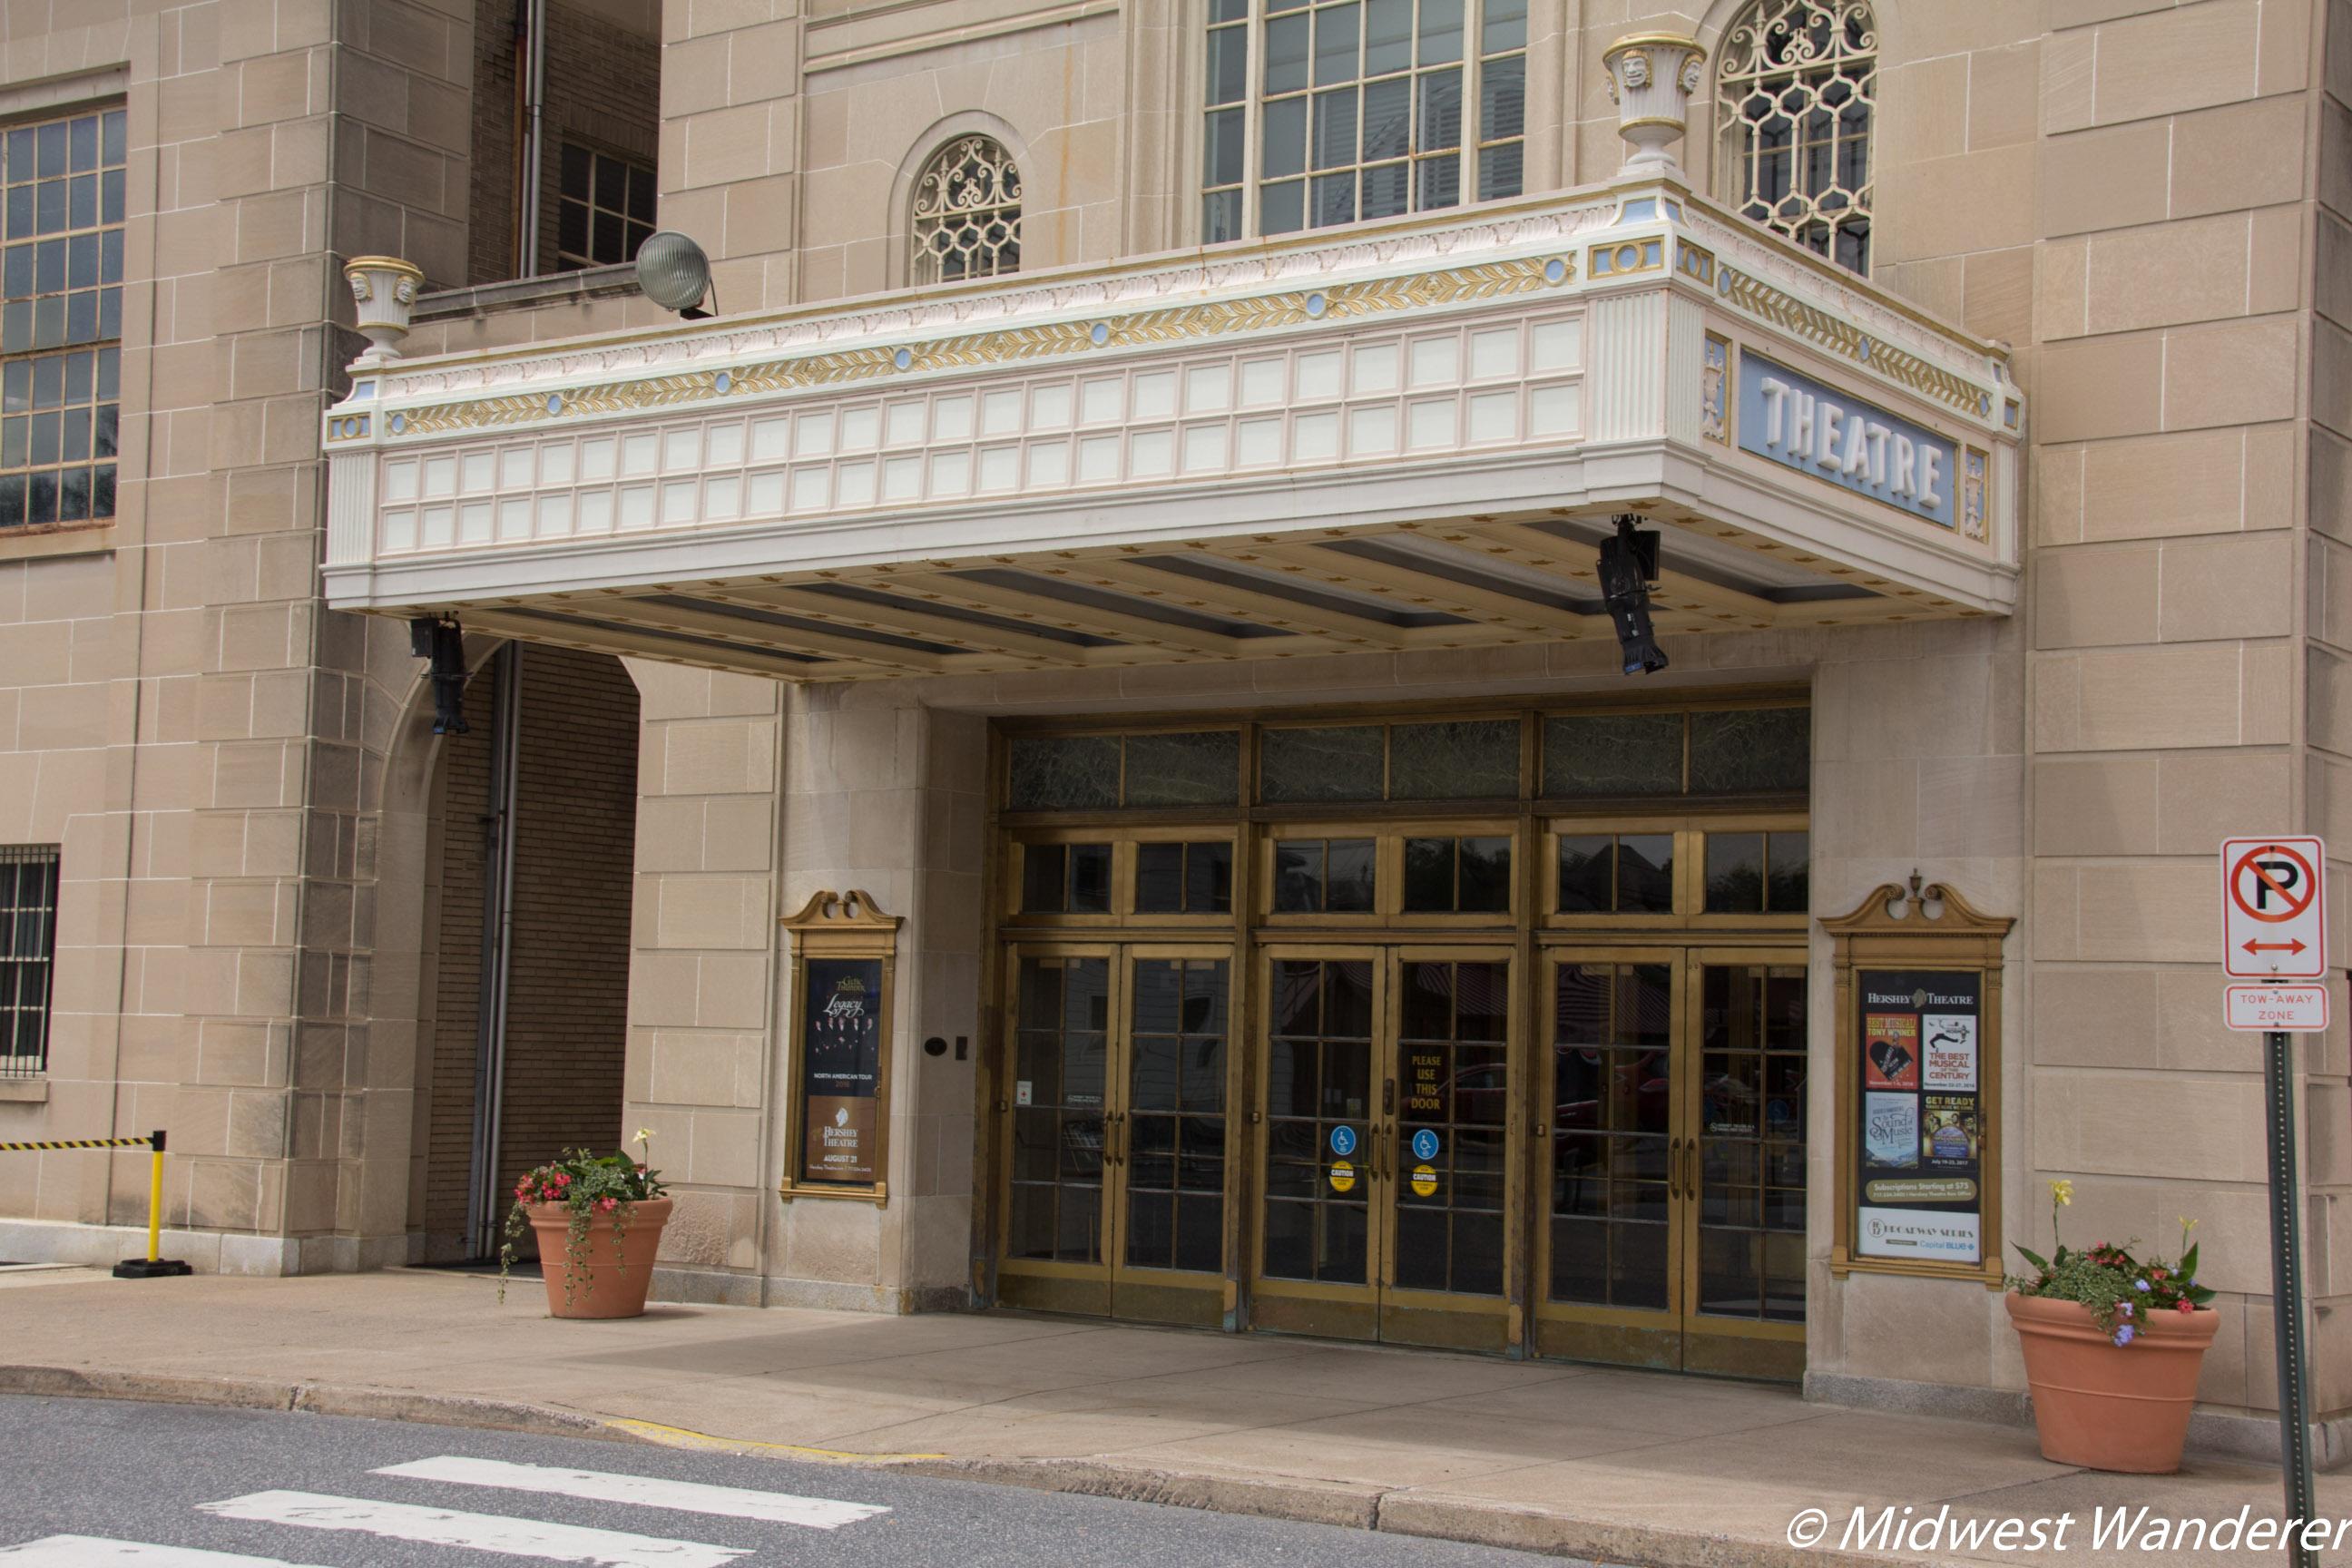 Hershey Theatre entrance